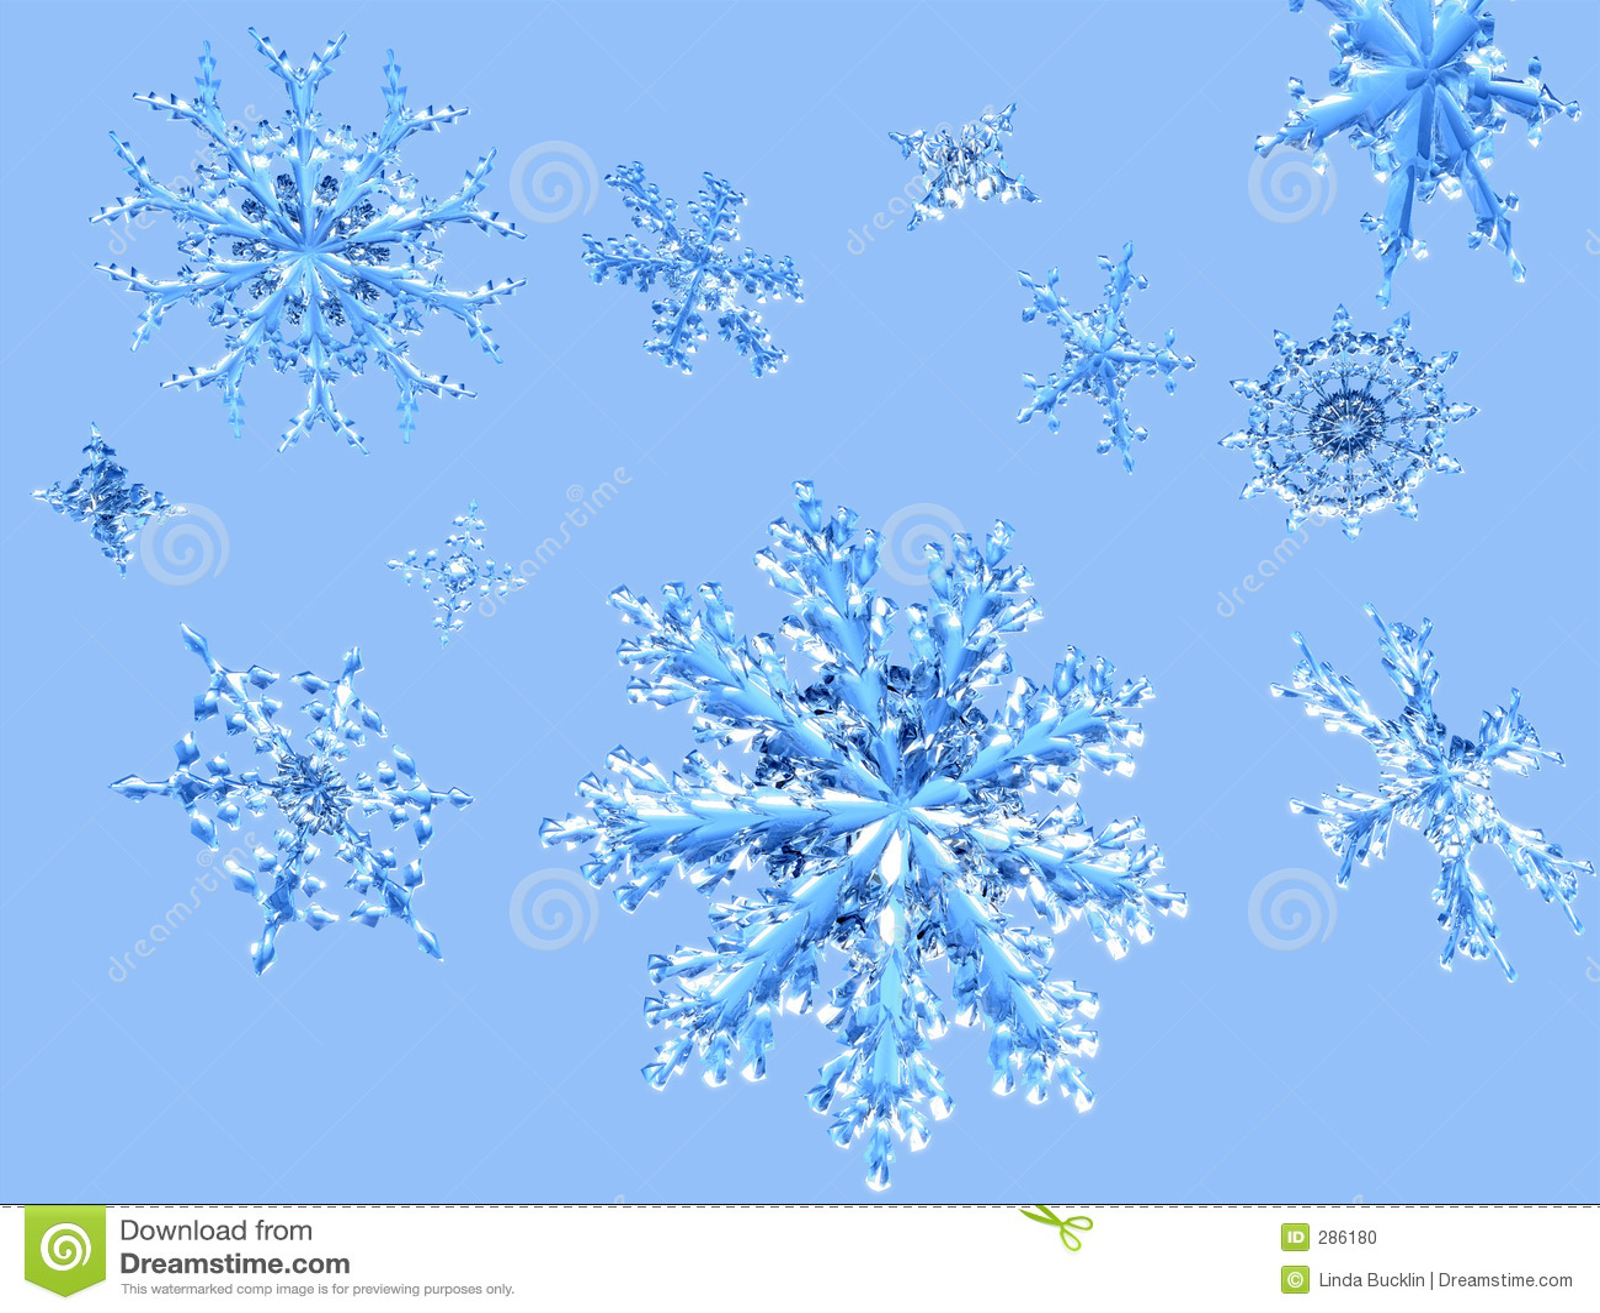 Schitterende Dalende Sneeuwvlokken